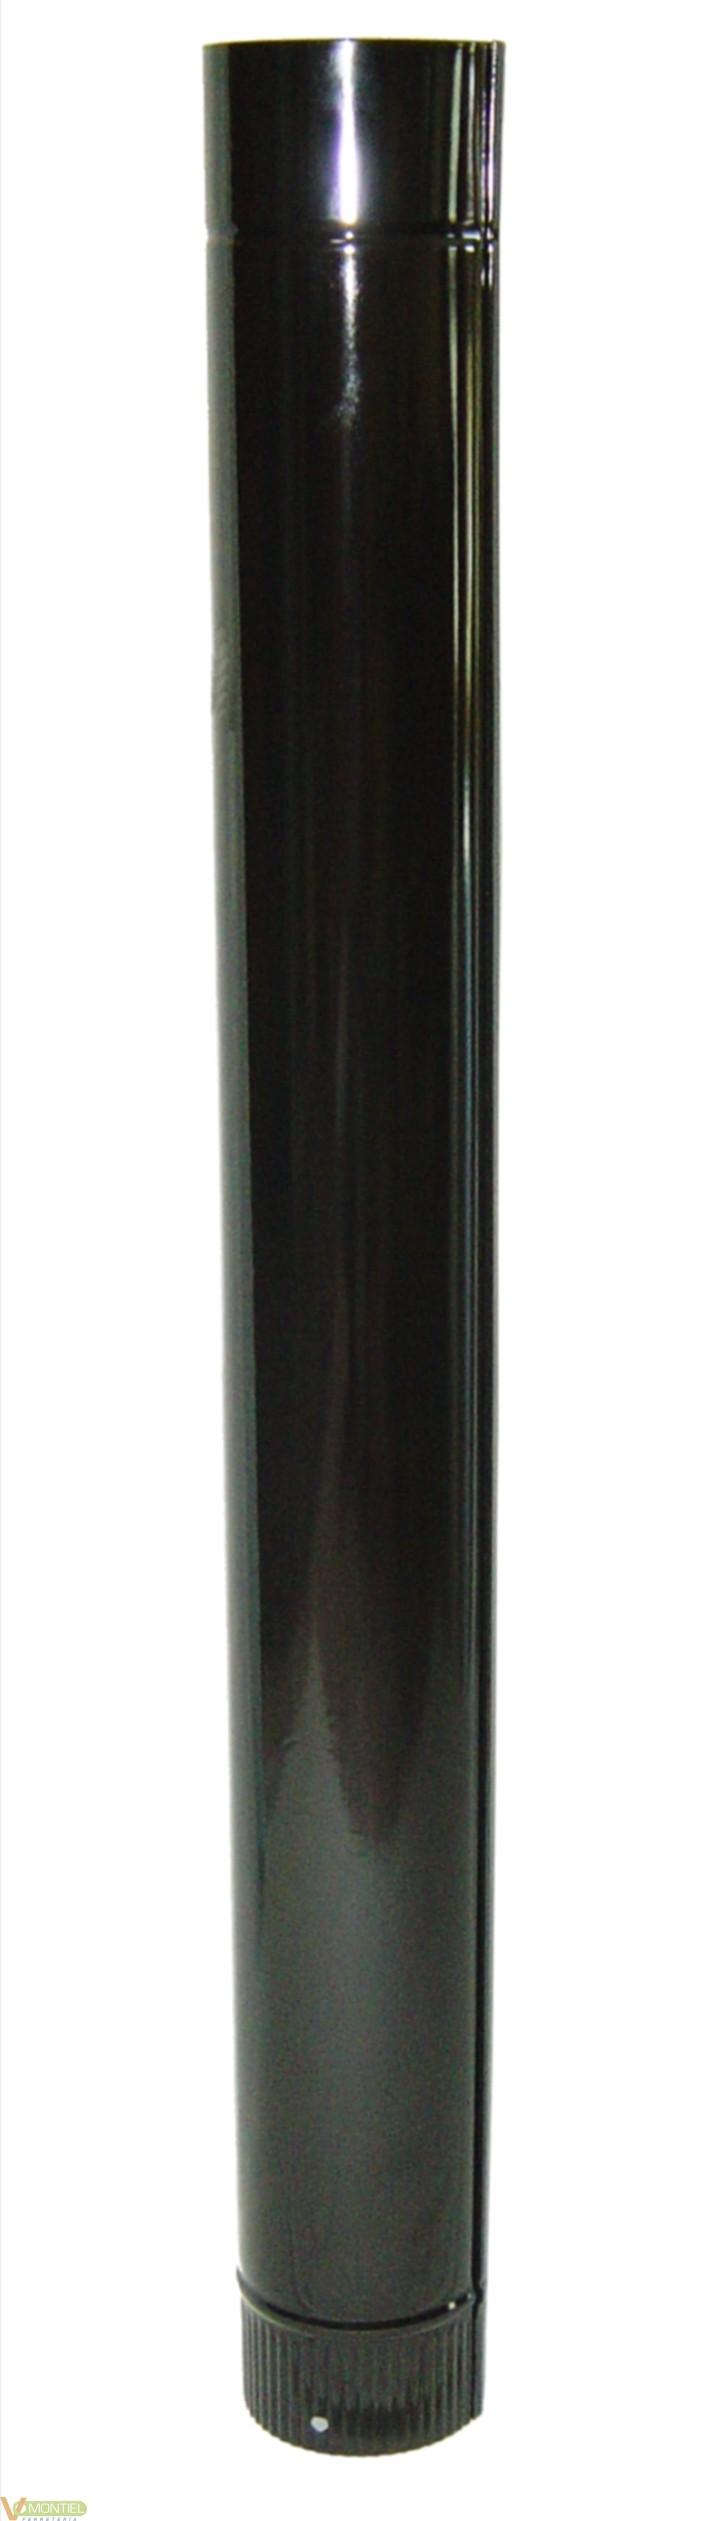 Tubo estufa 150mm a/esm-0